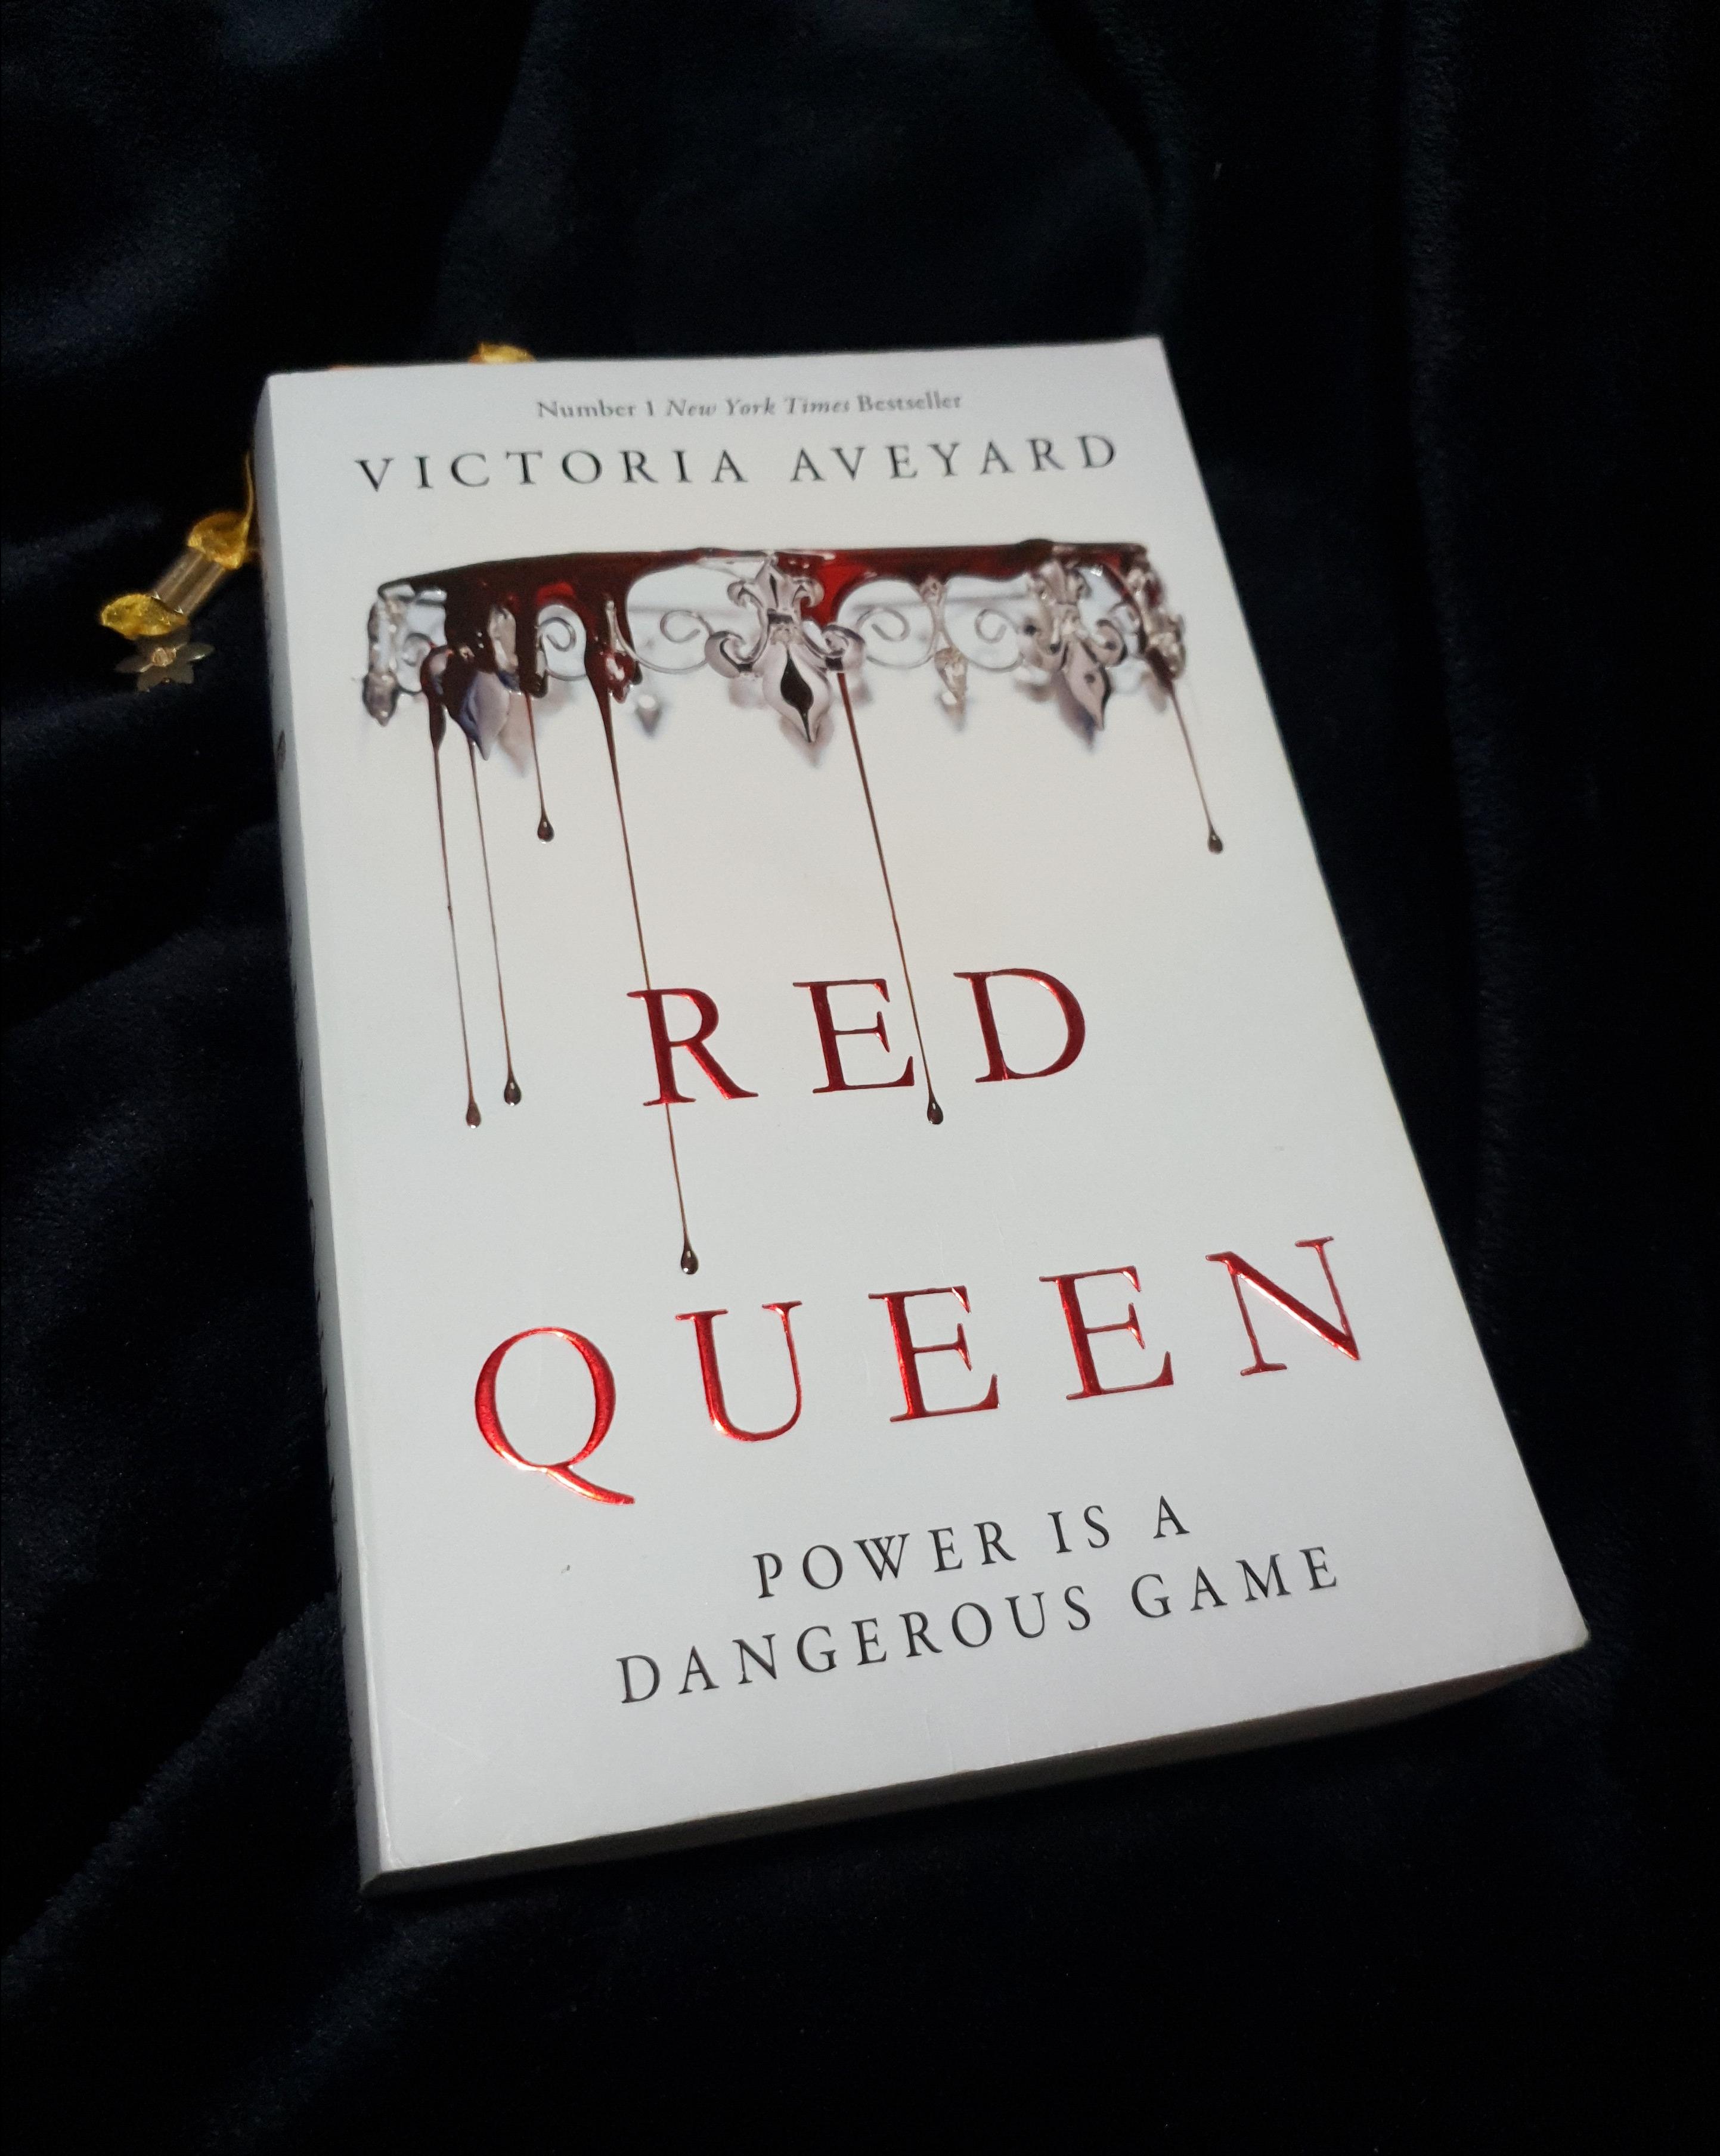 red-queen-by-victoria-aveyard1.jpg